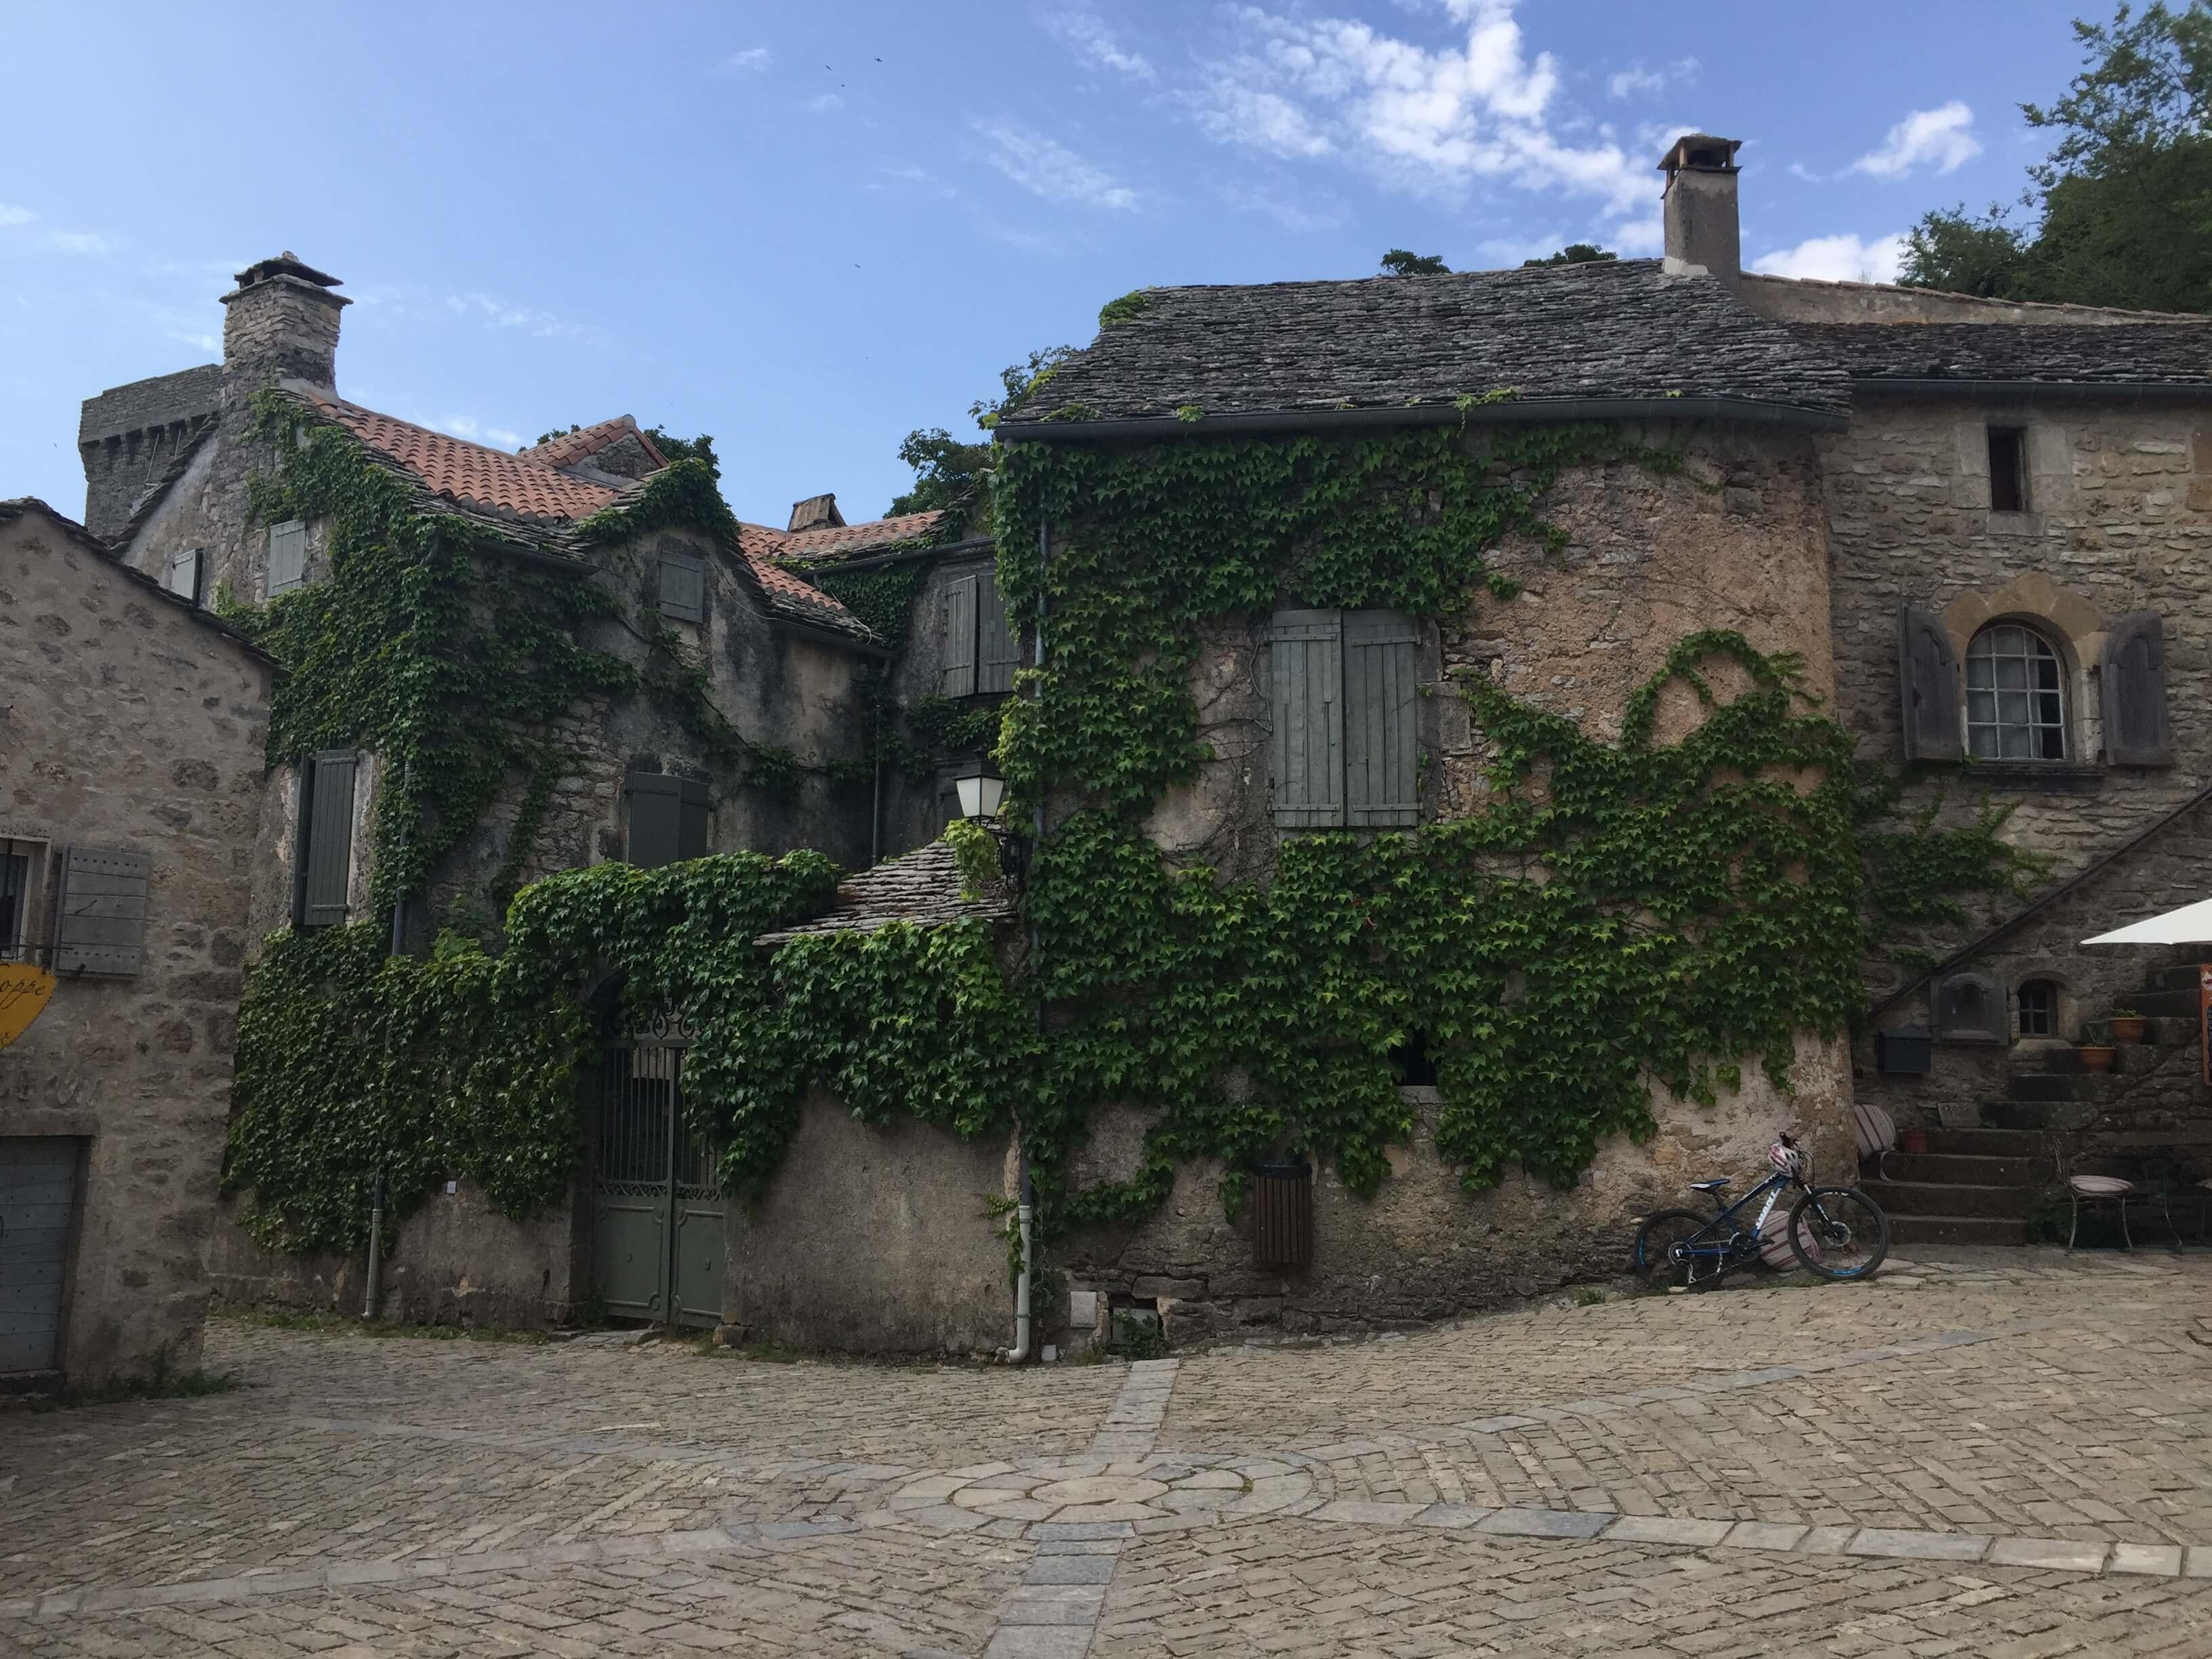 La Couvertoirade, France